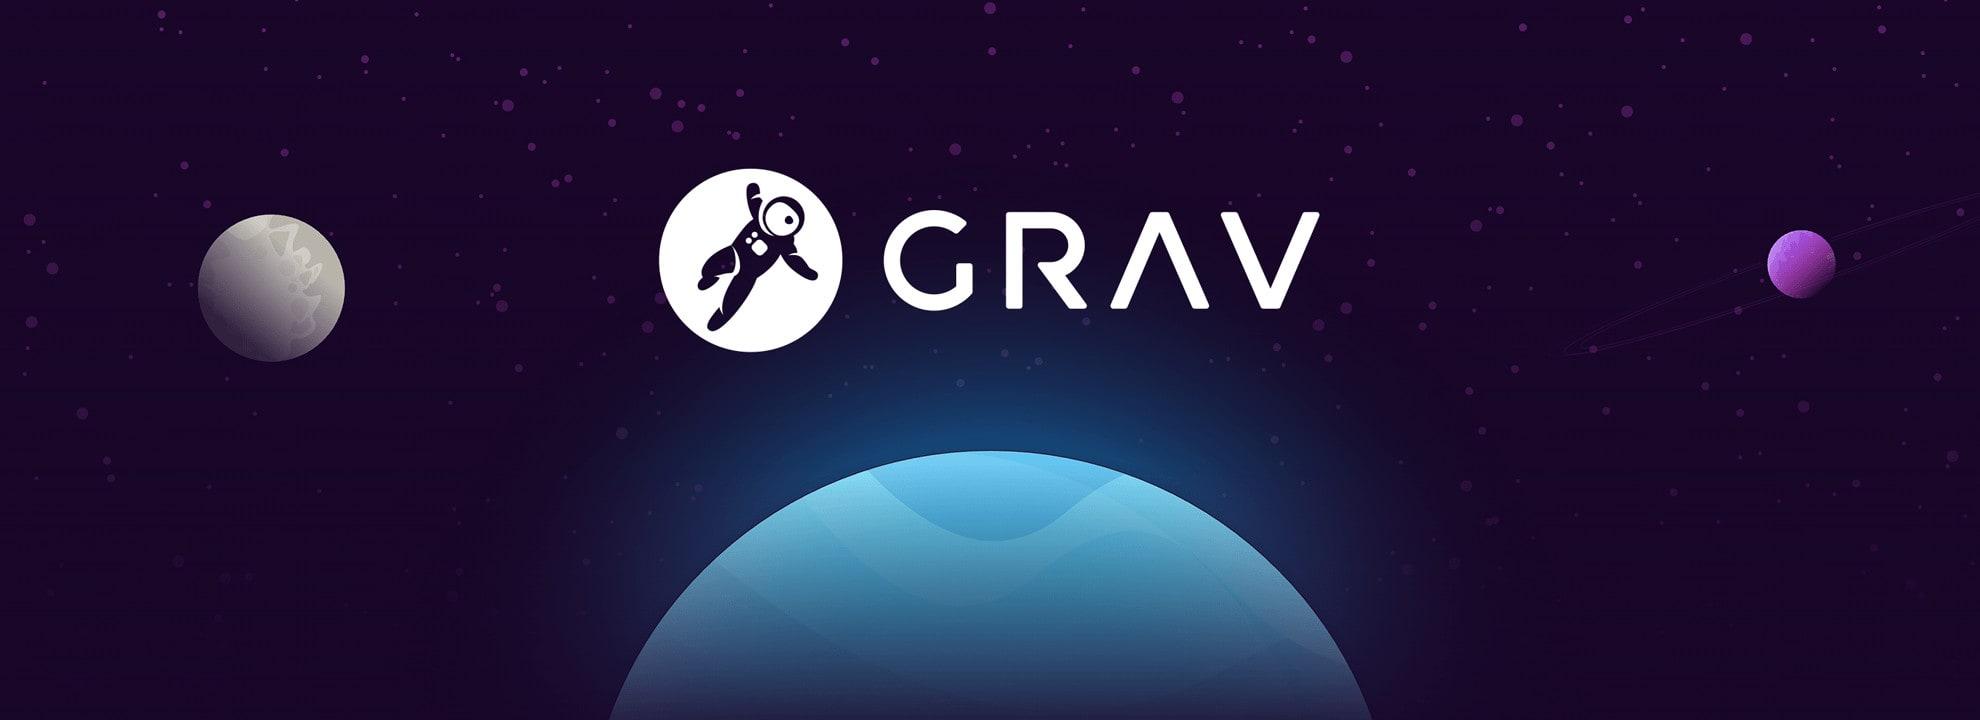 Grav Flat-File CMS